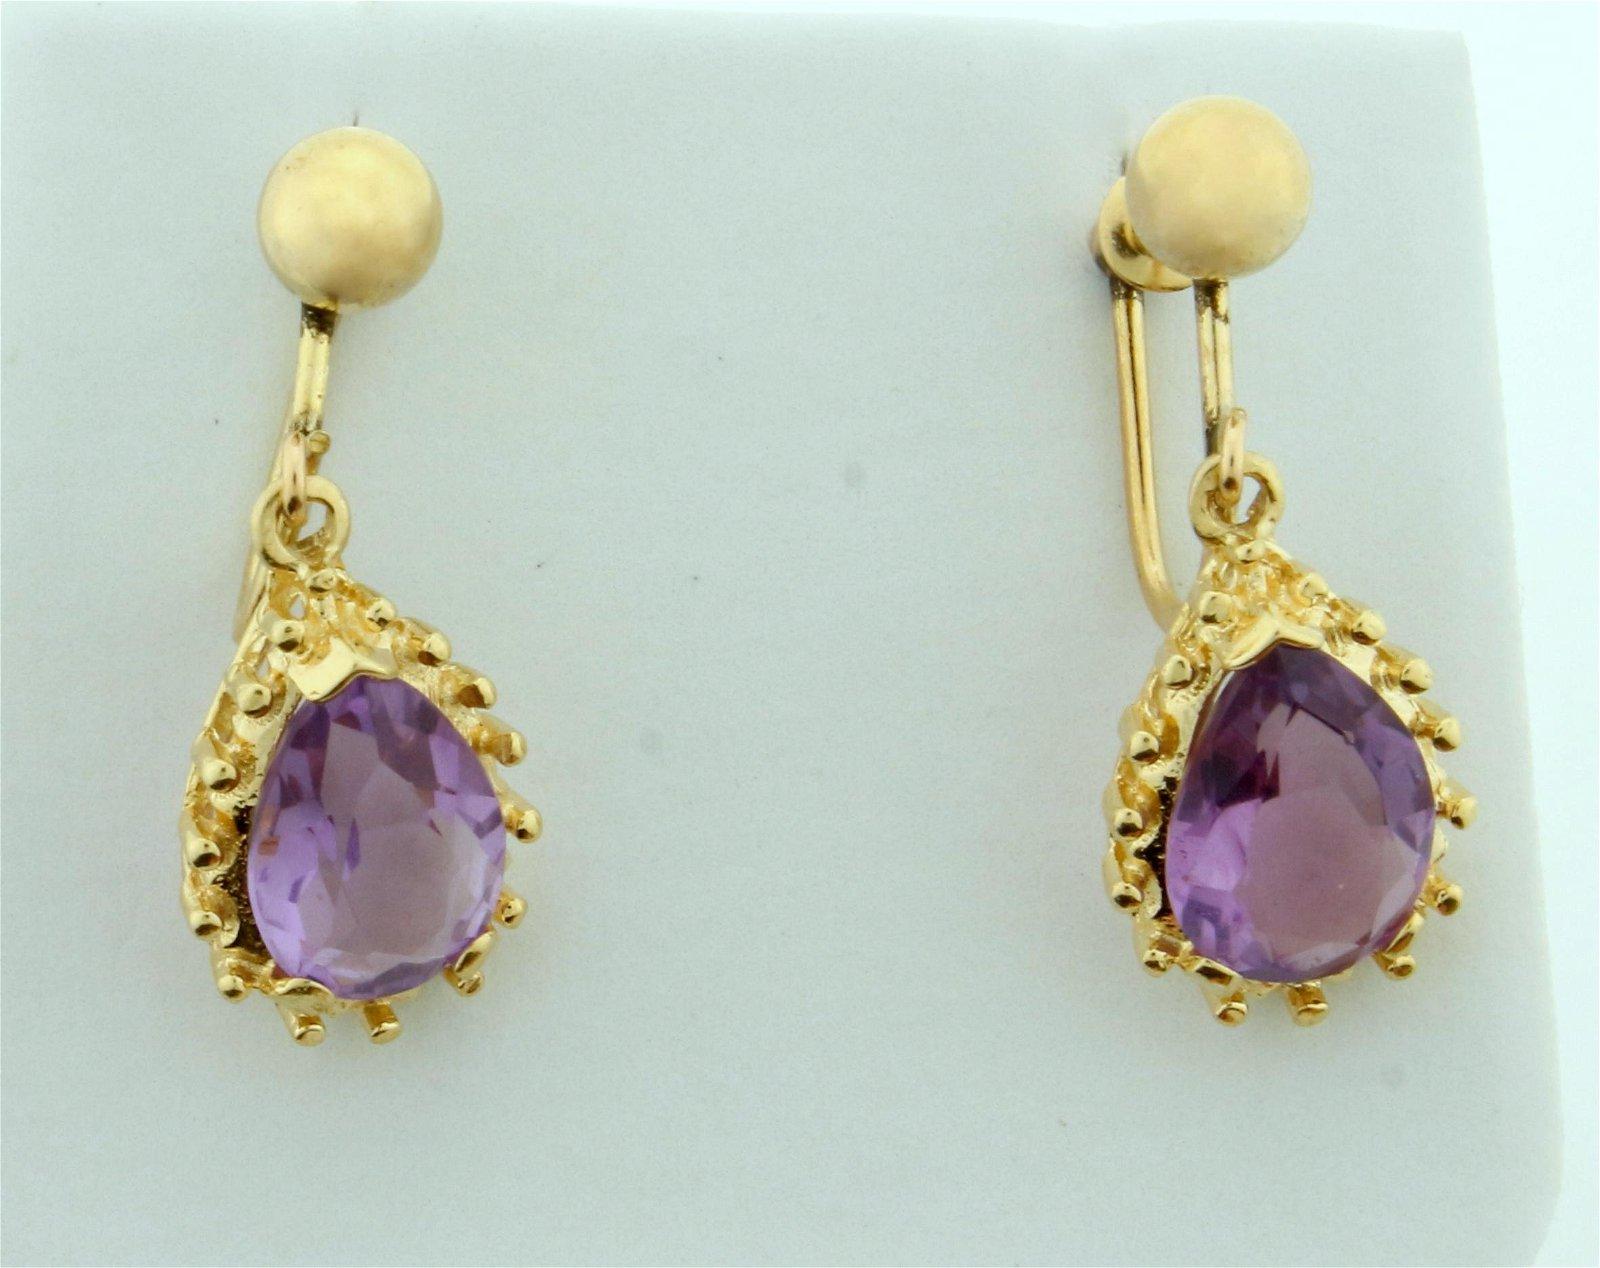 Vintage Screw Back 4ct TW Amethyst Dangle Earrings in